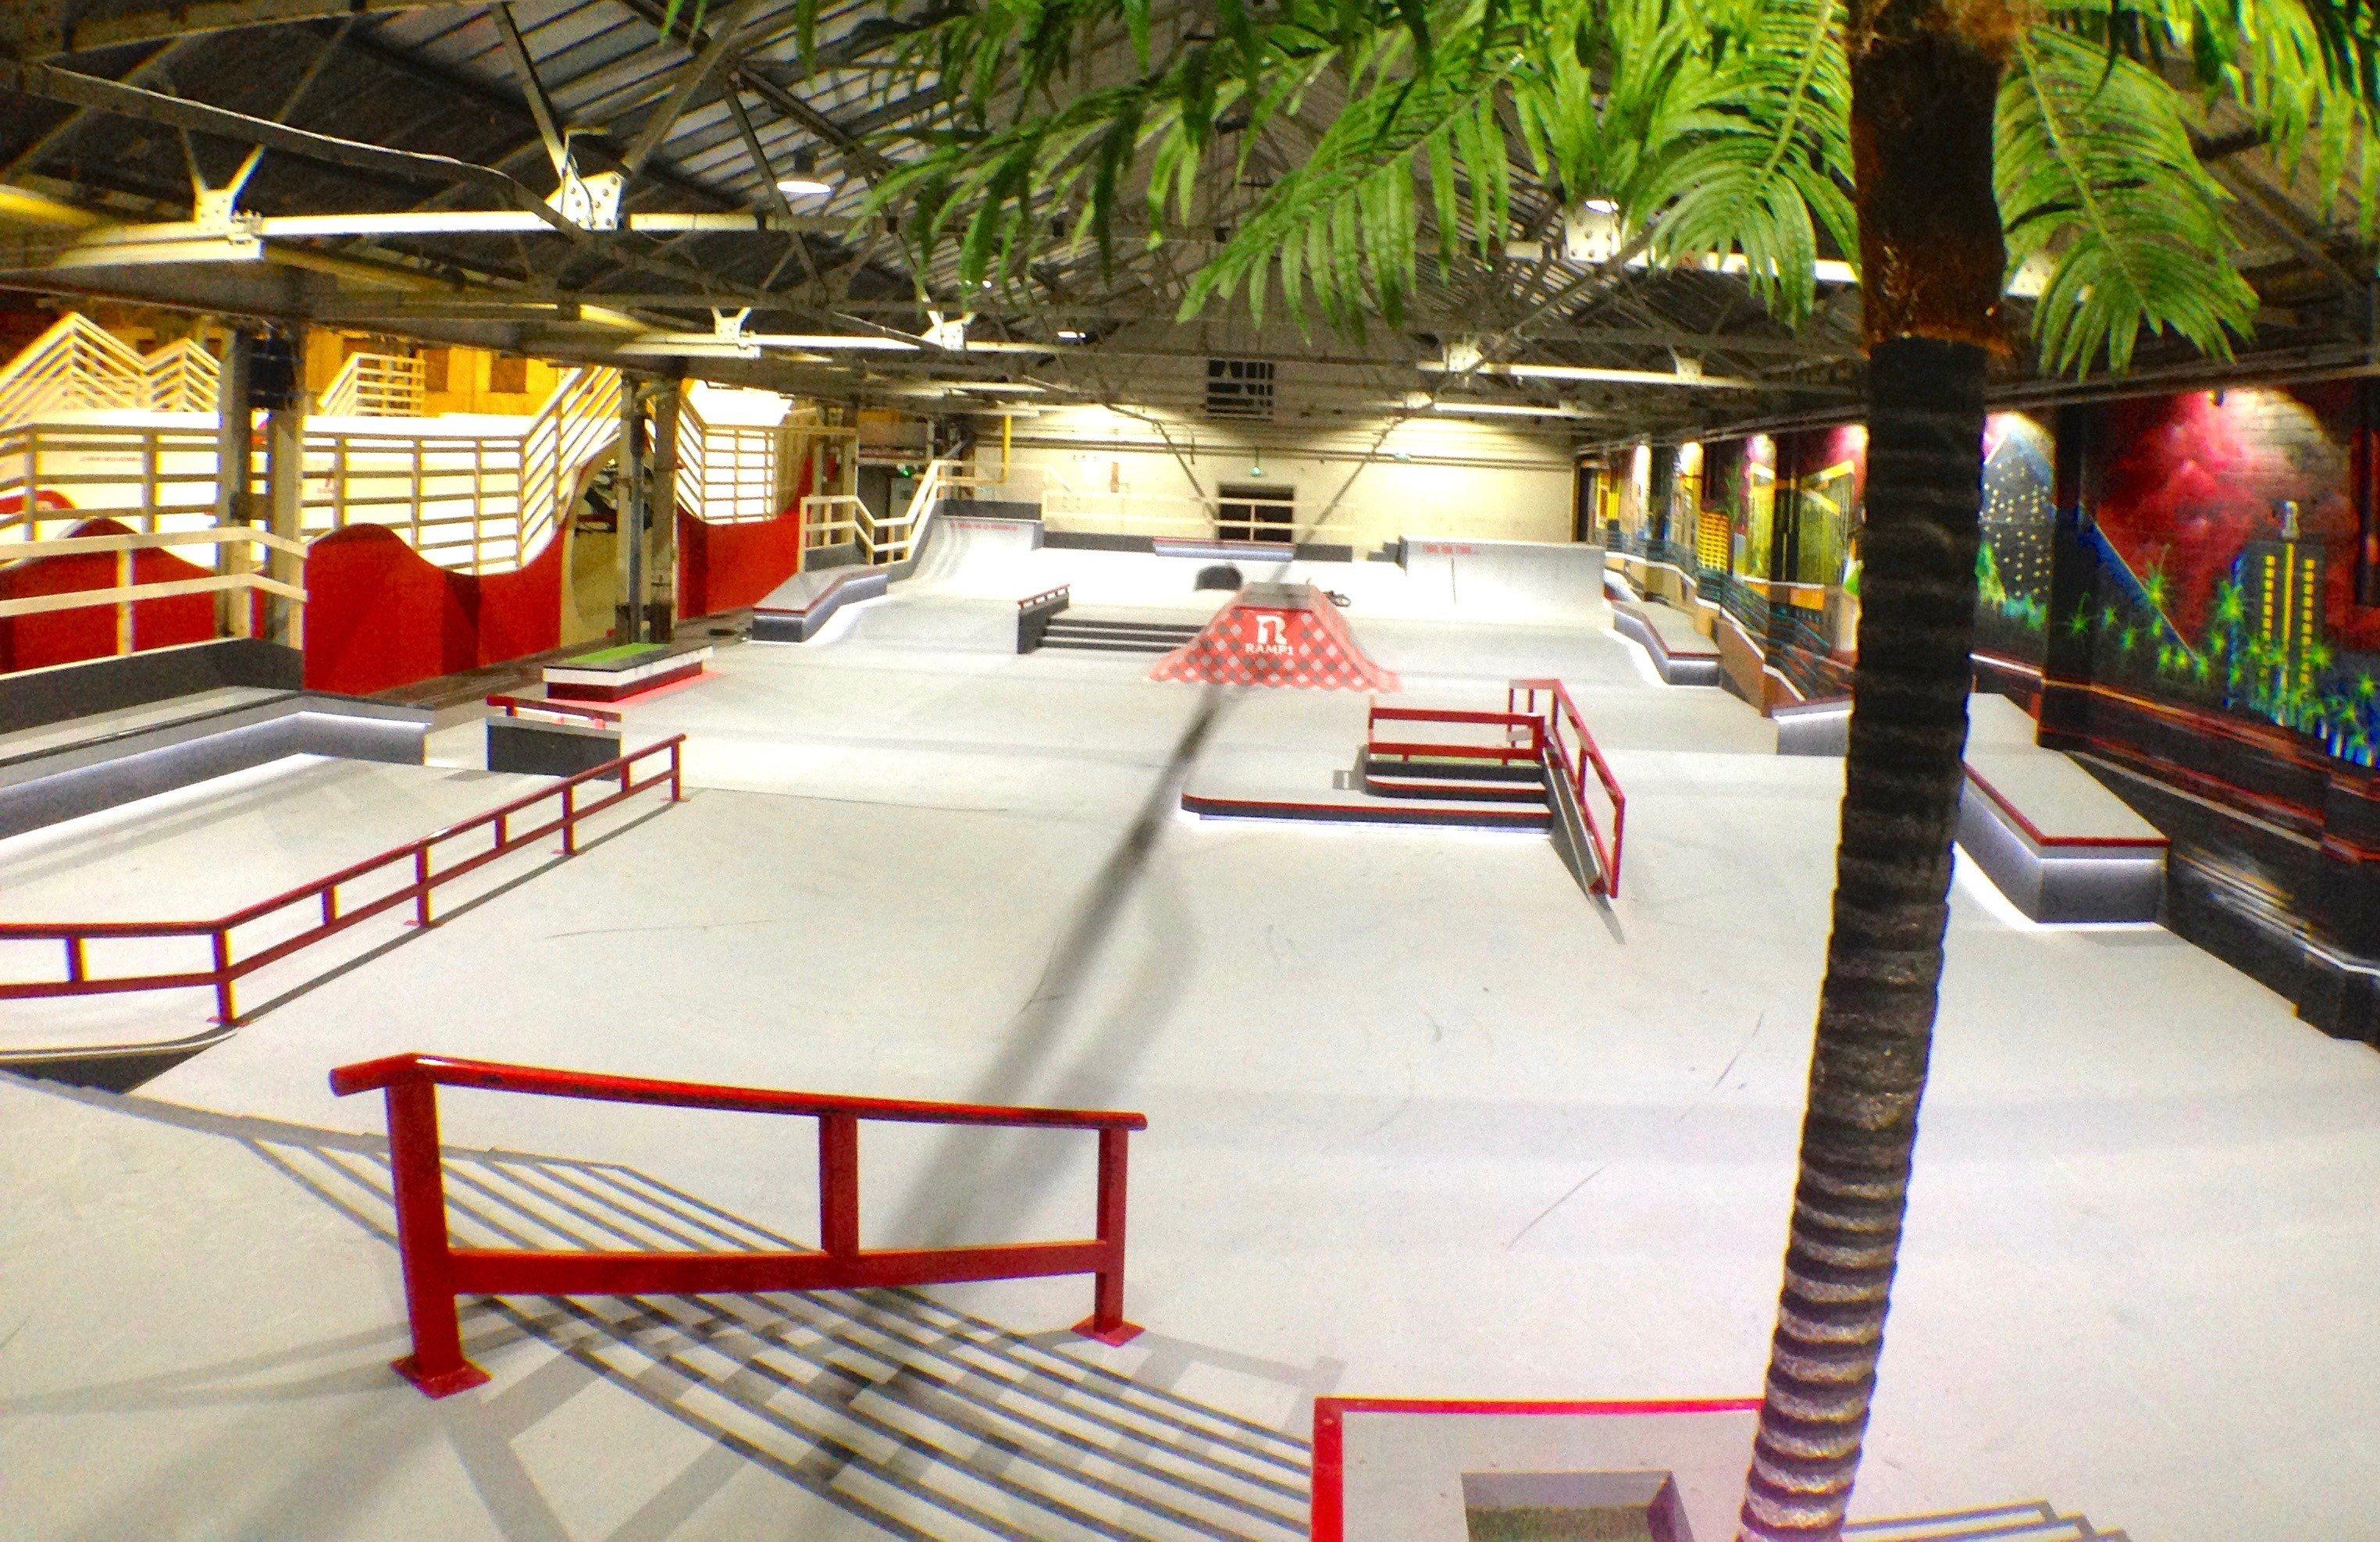 Indoor street Plaza skatepark